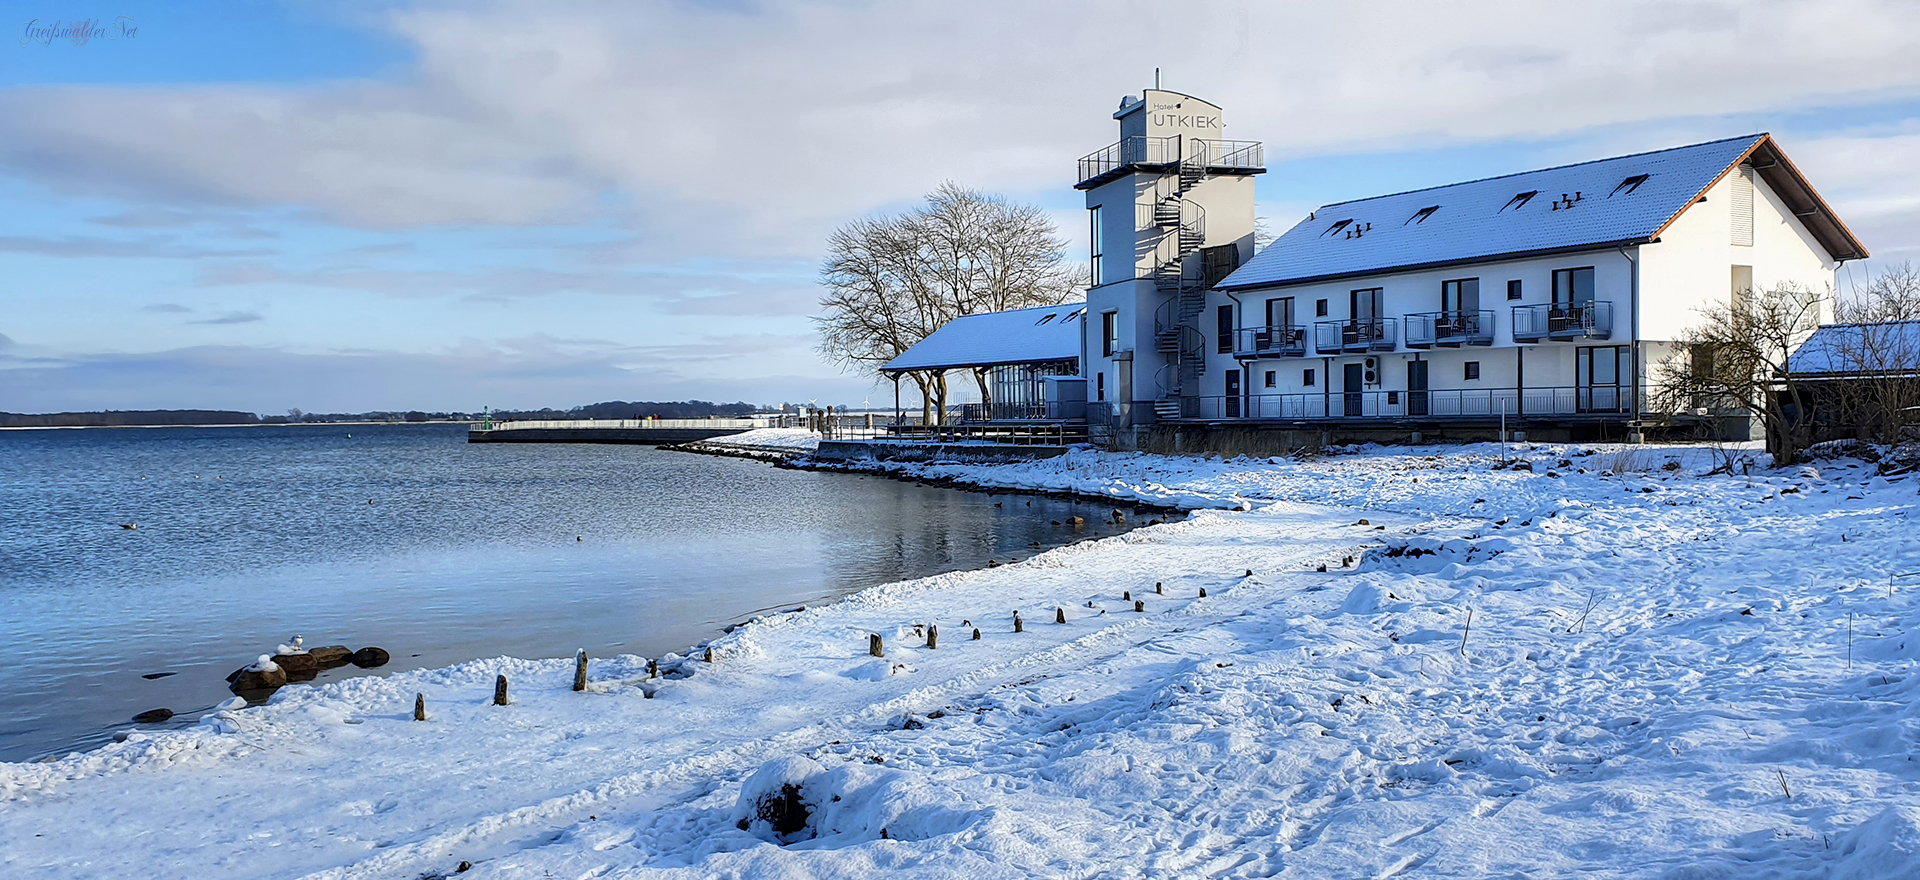 Winter am Utkiek in Greifswald-Wieck